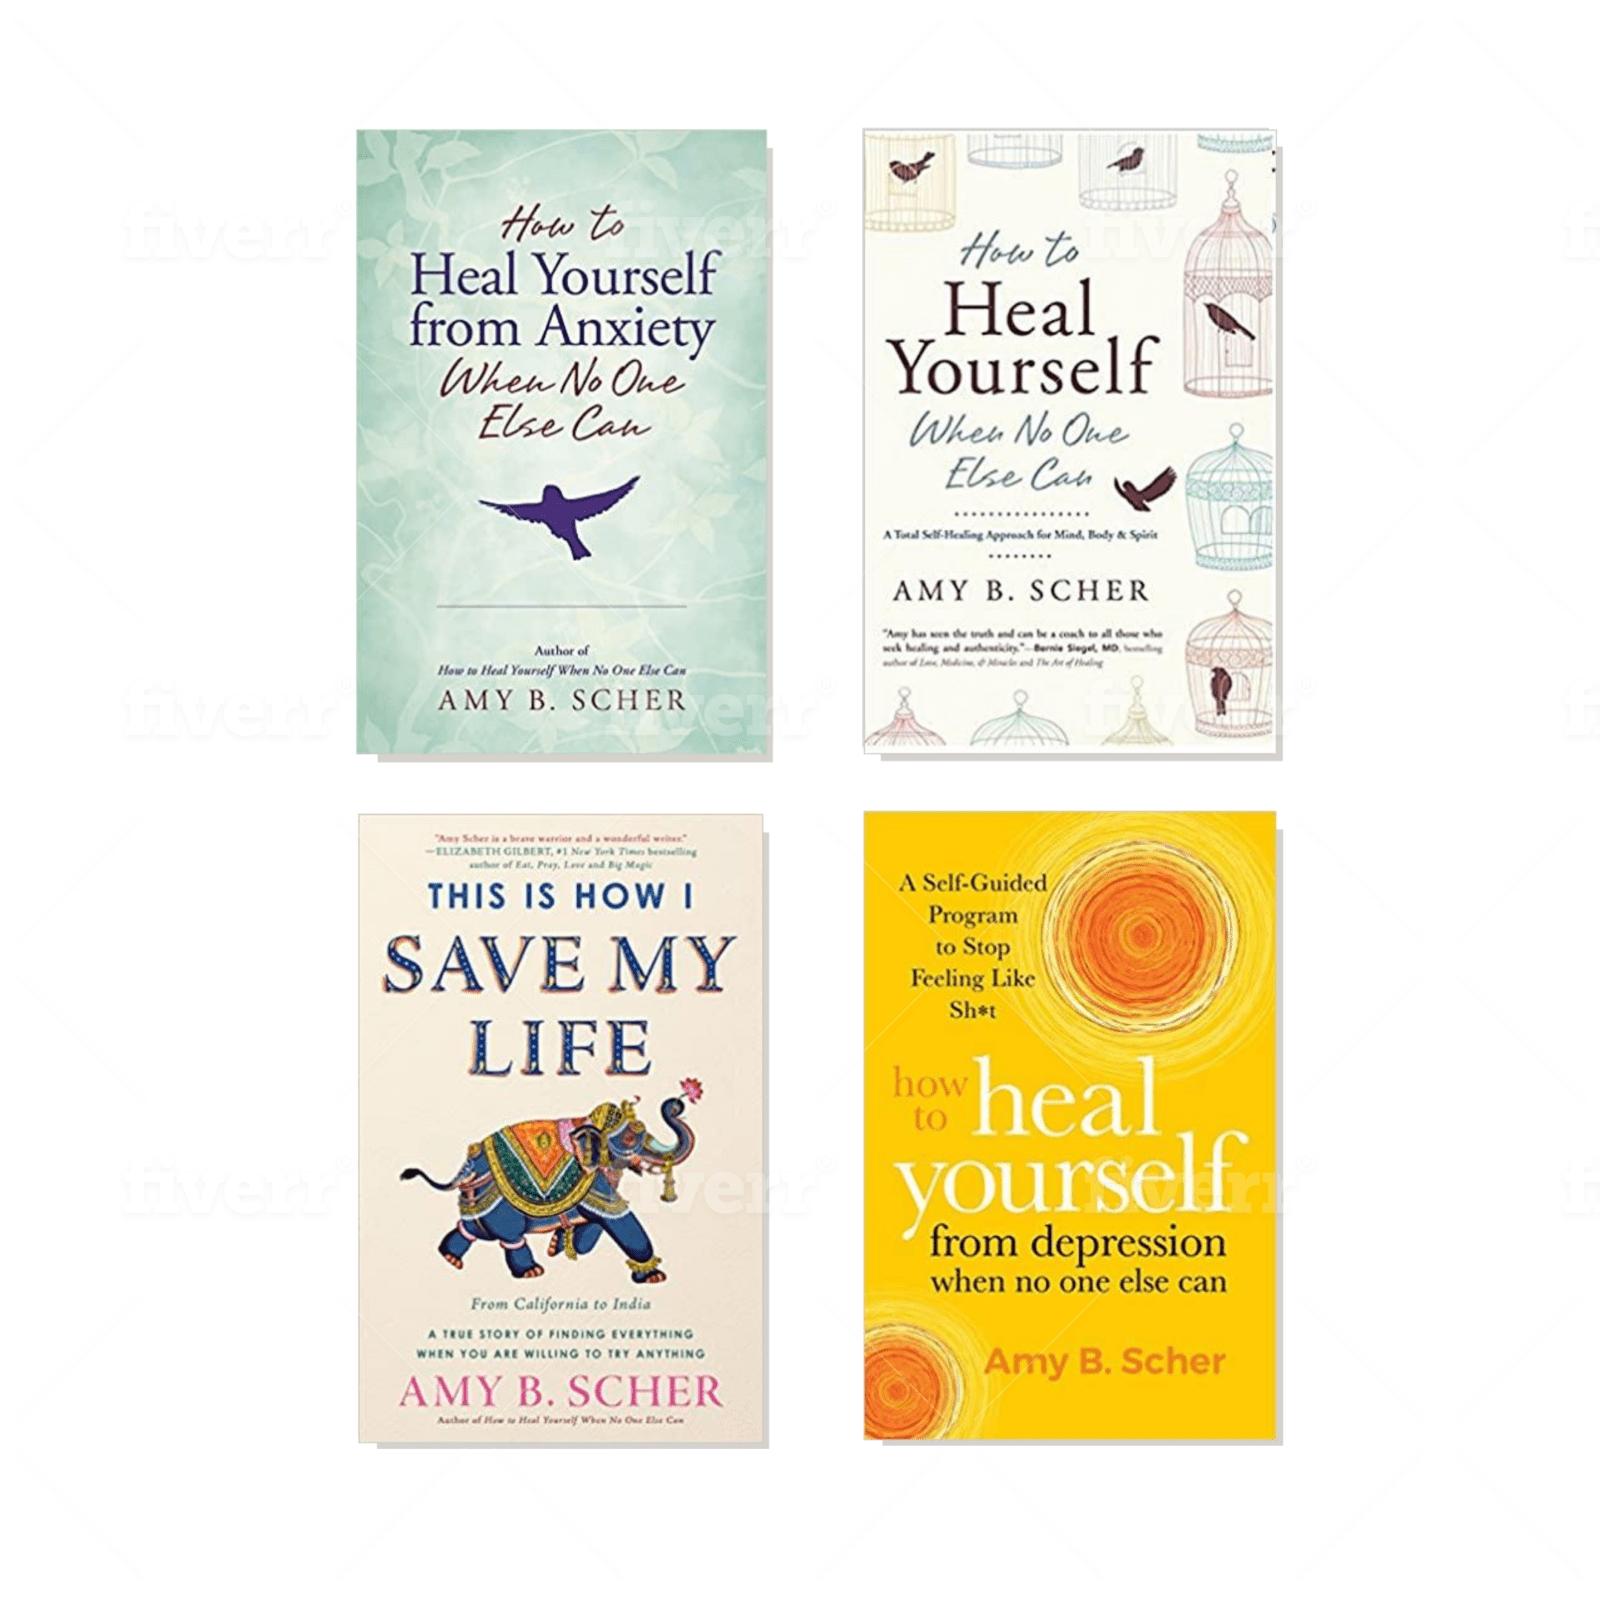 Amy Scher's books